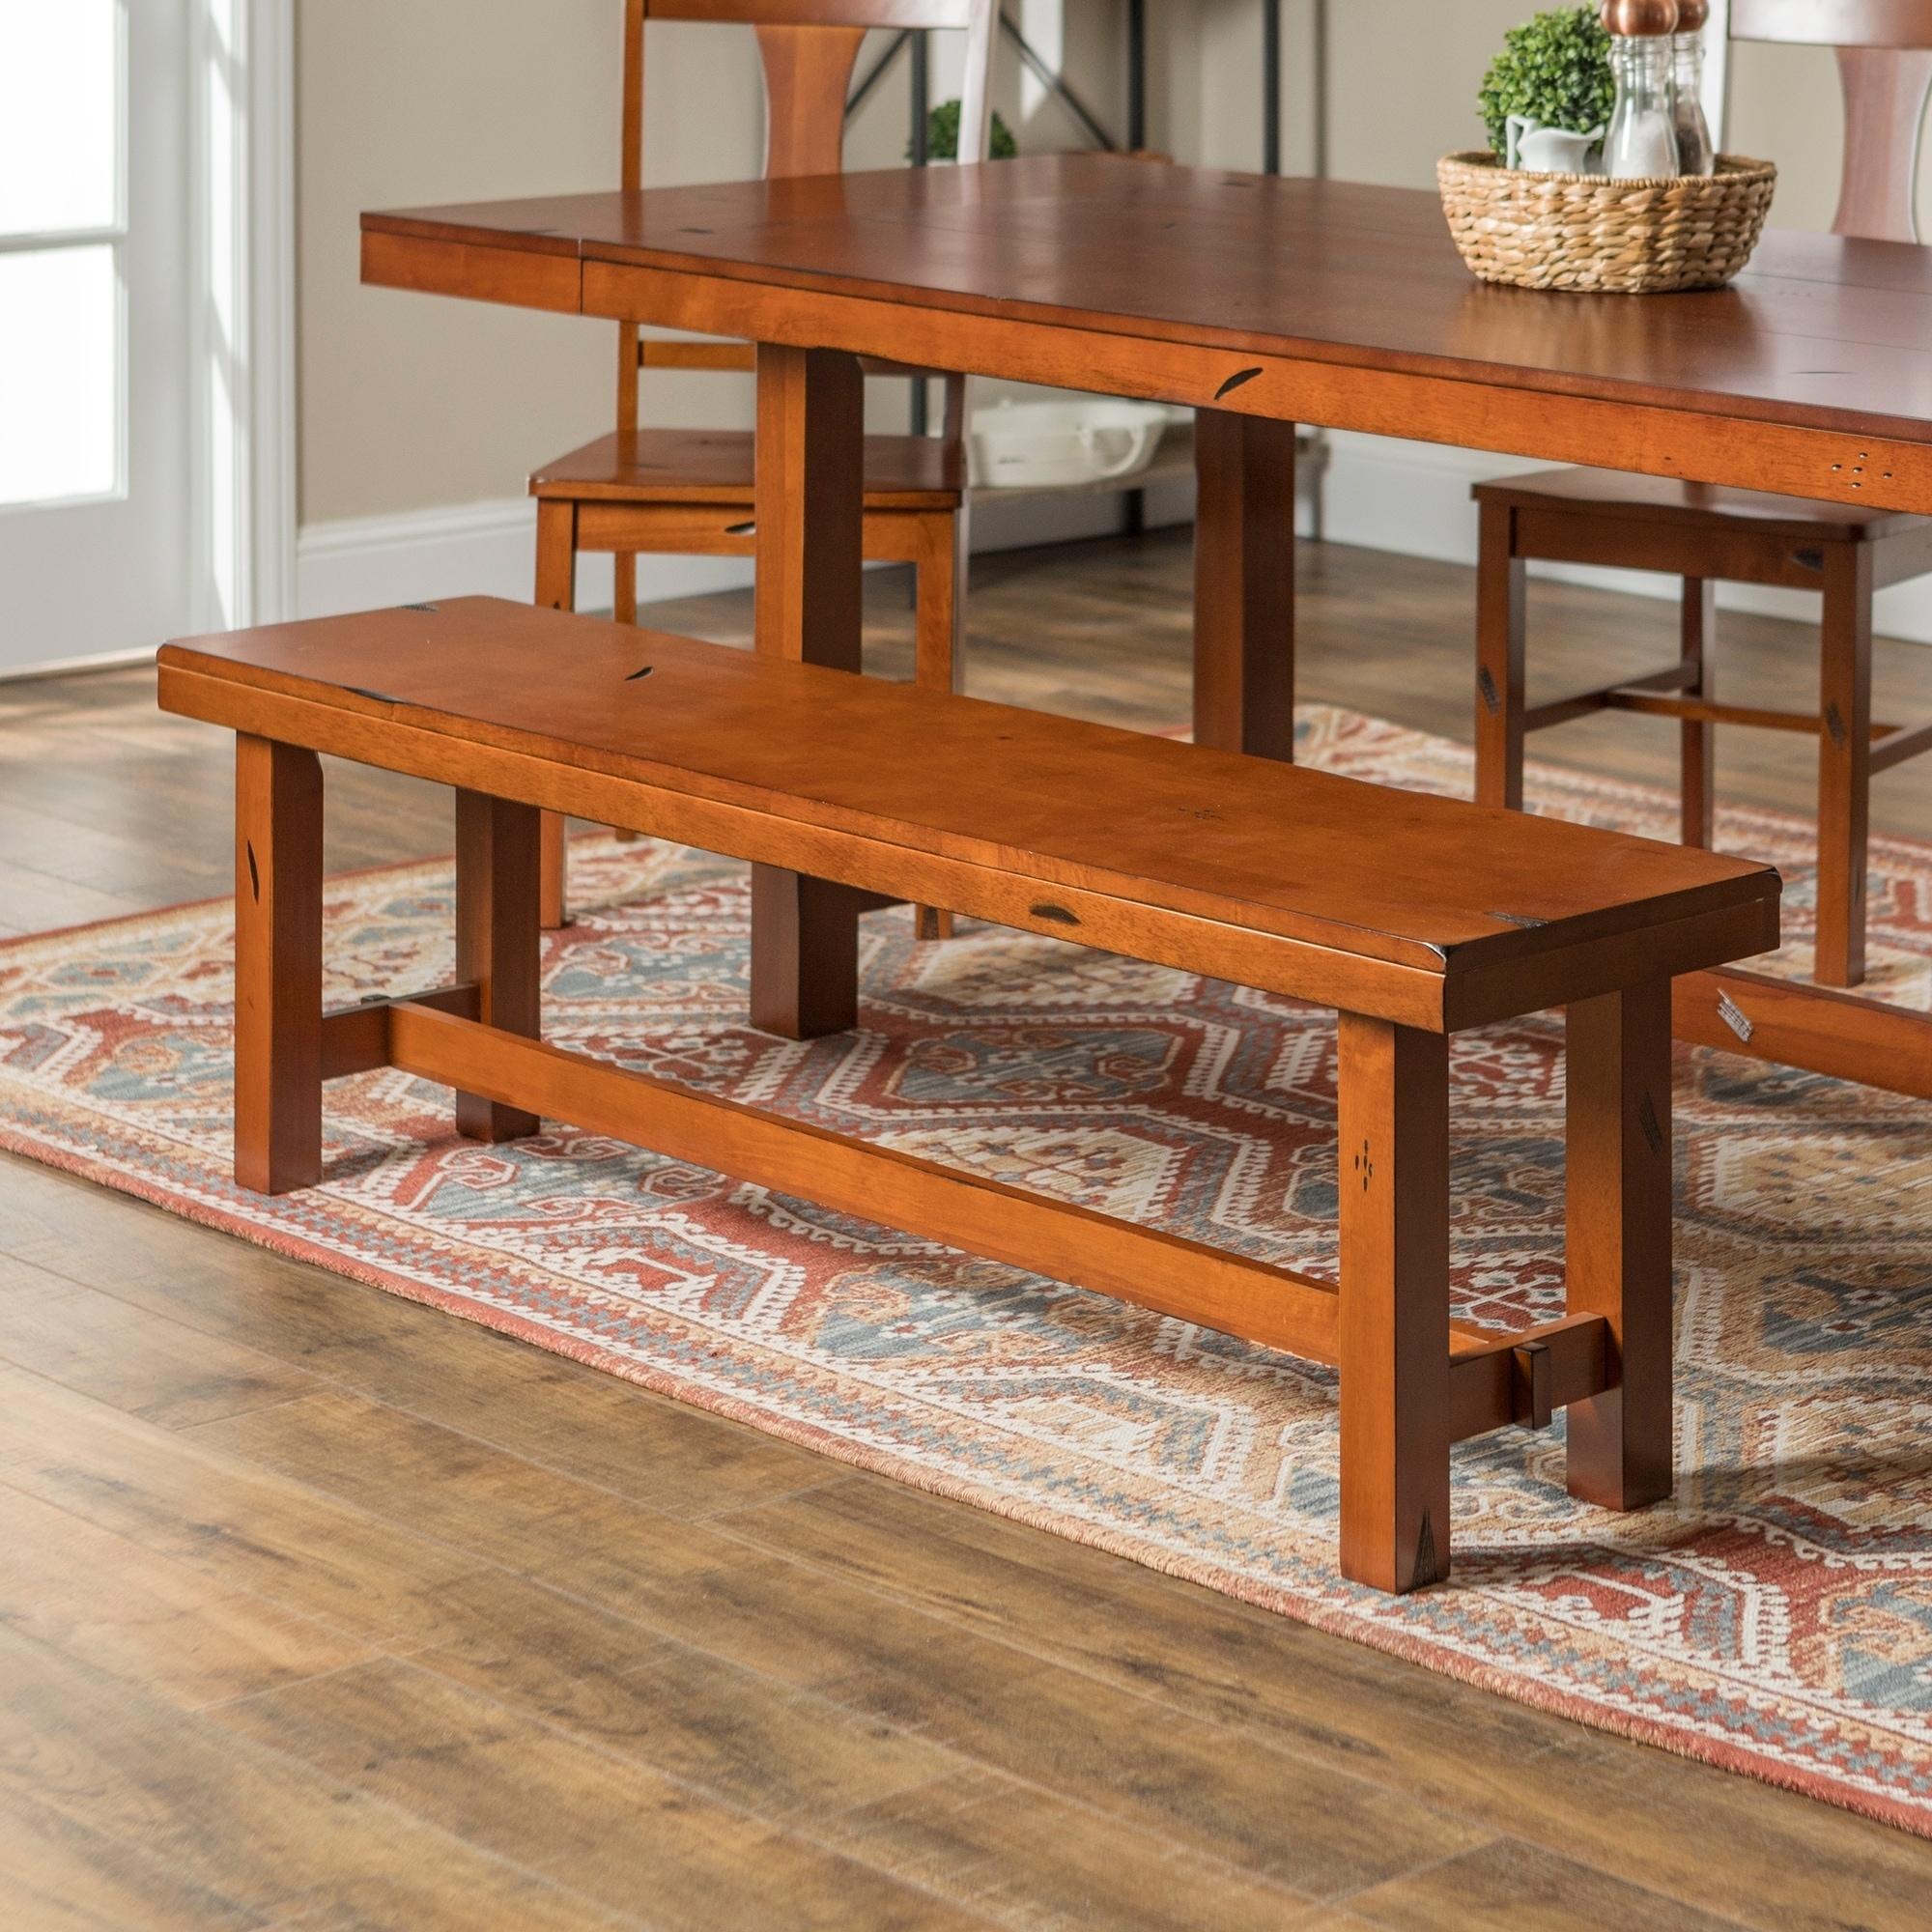 Surprising 60 Wood Dining Bench Dark Oak 60 X 14 X 18H Alphanode Cool Chair Designs And Ideas Alphanodeonline